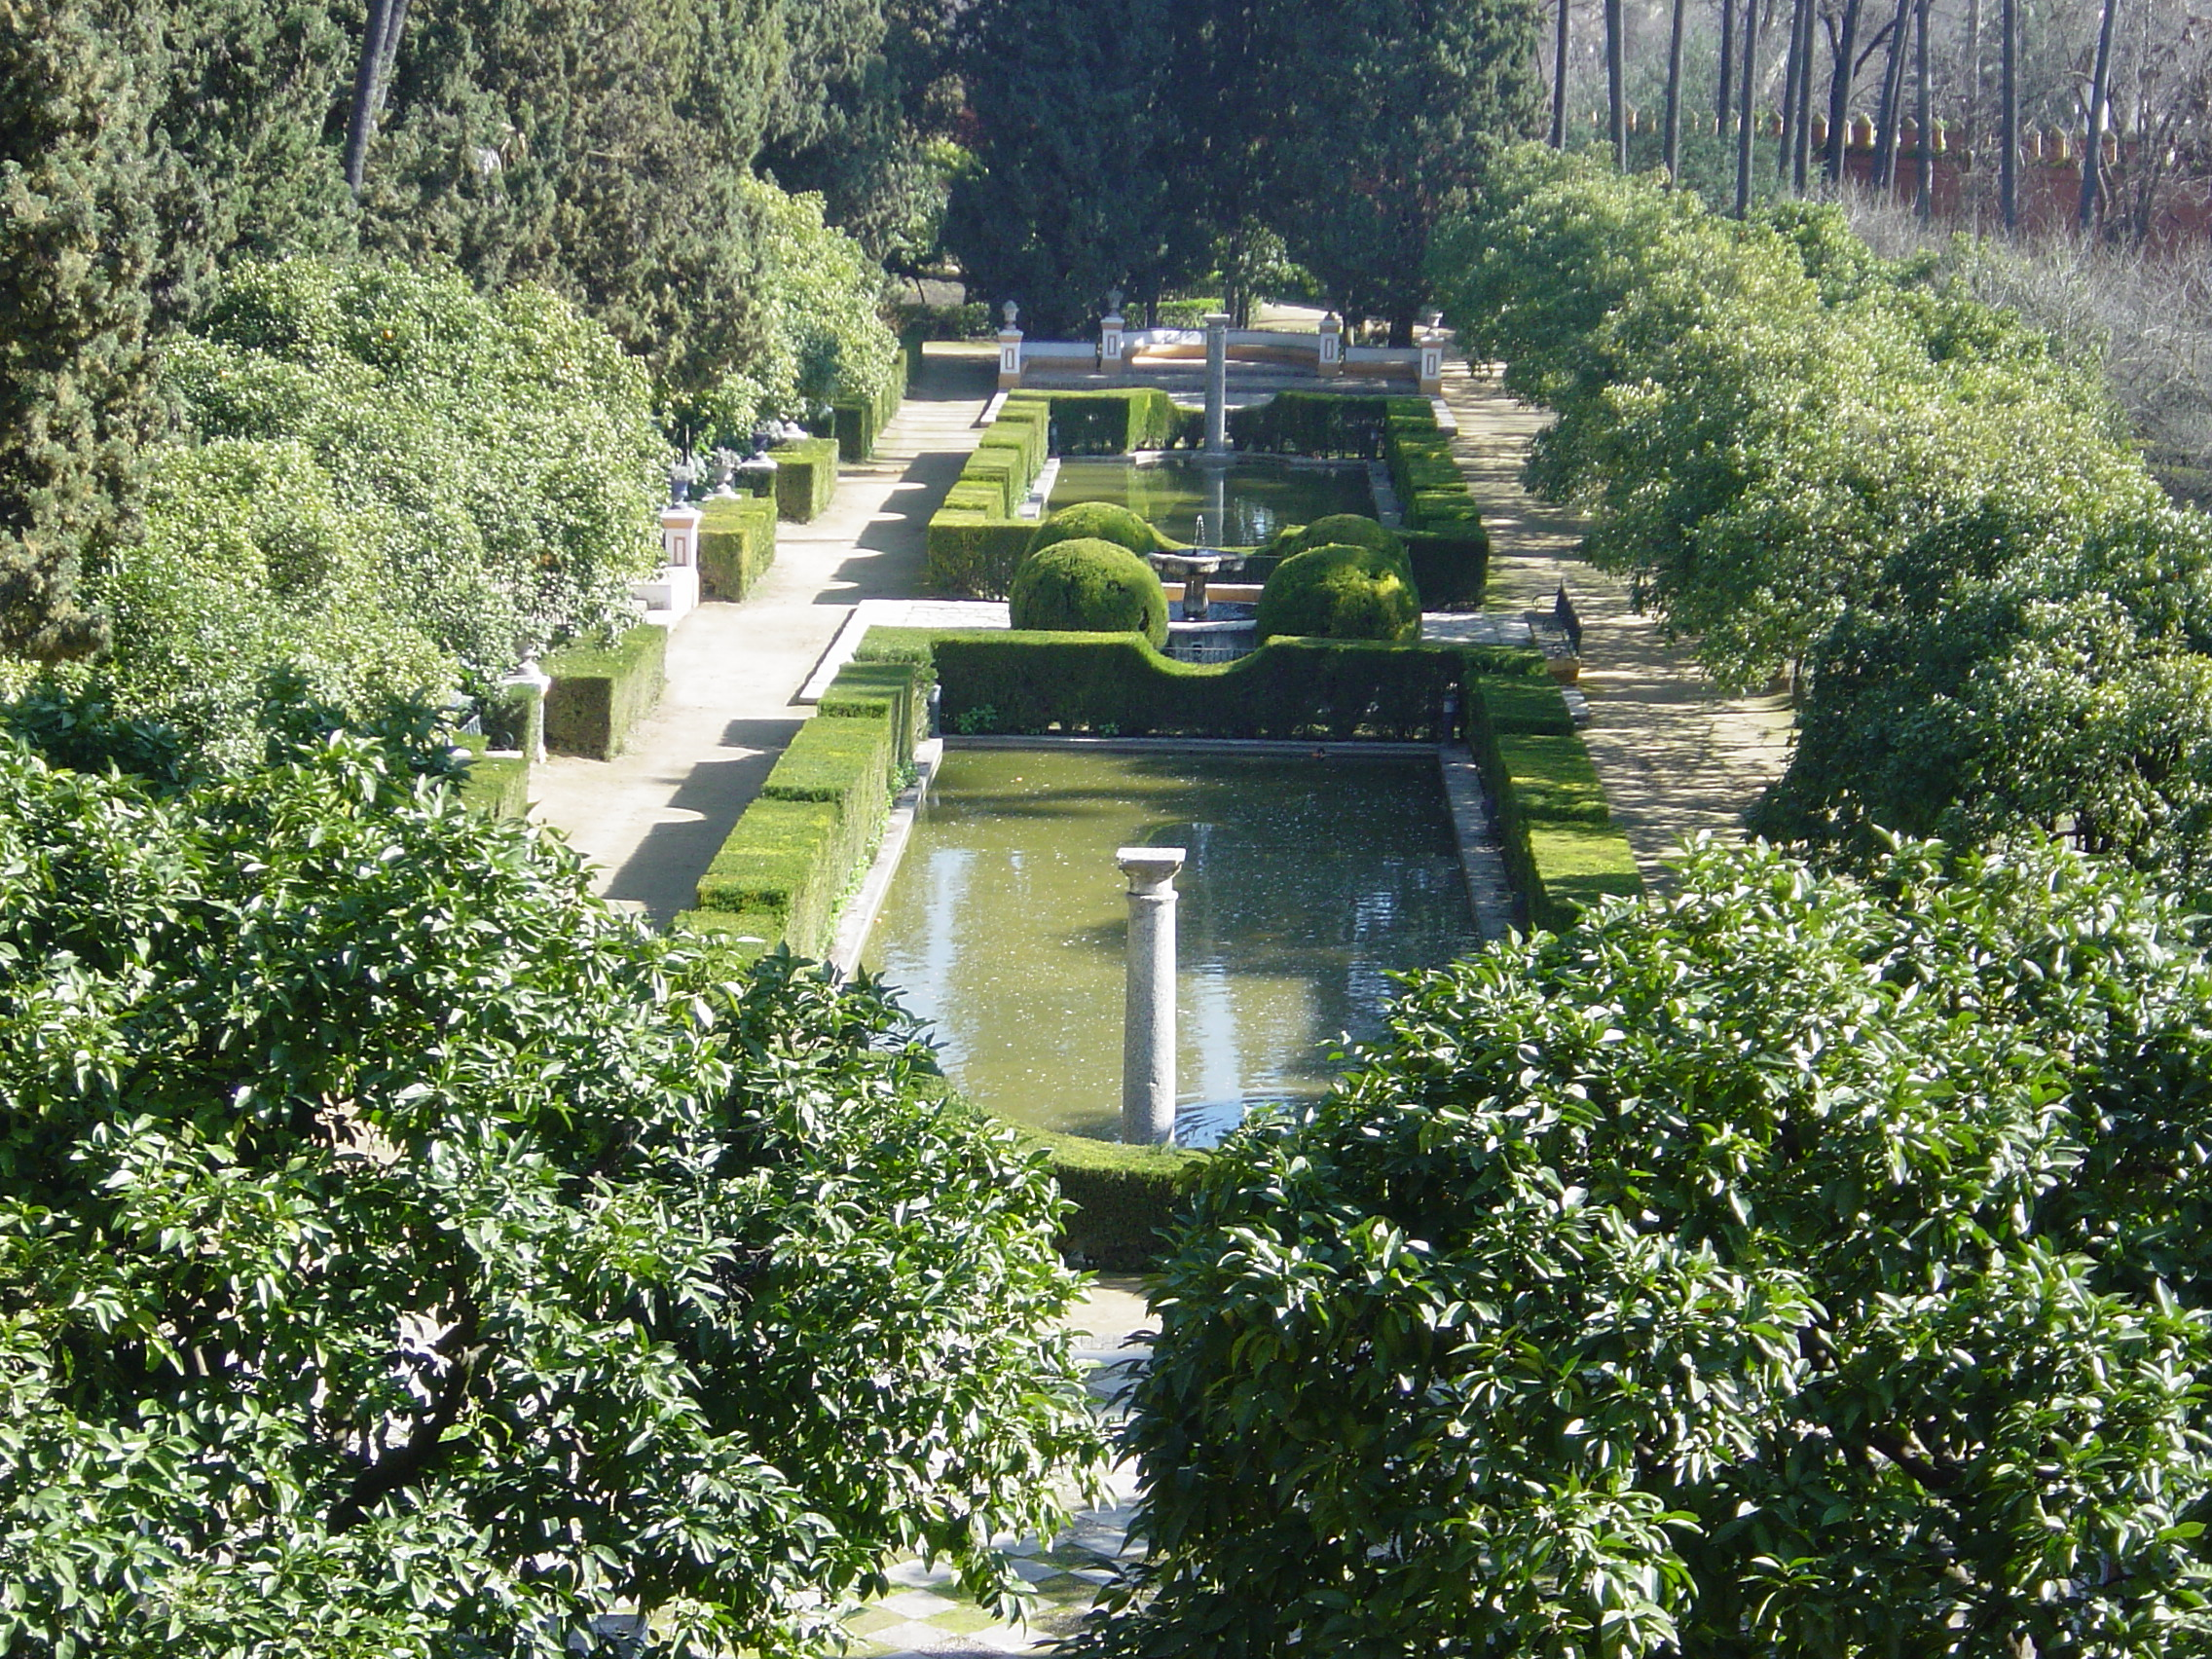 Jard n espa ol wikiwand for Jardin spanish